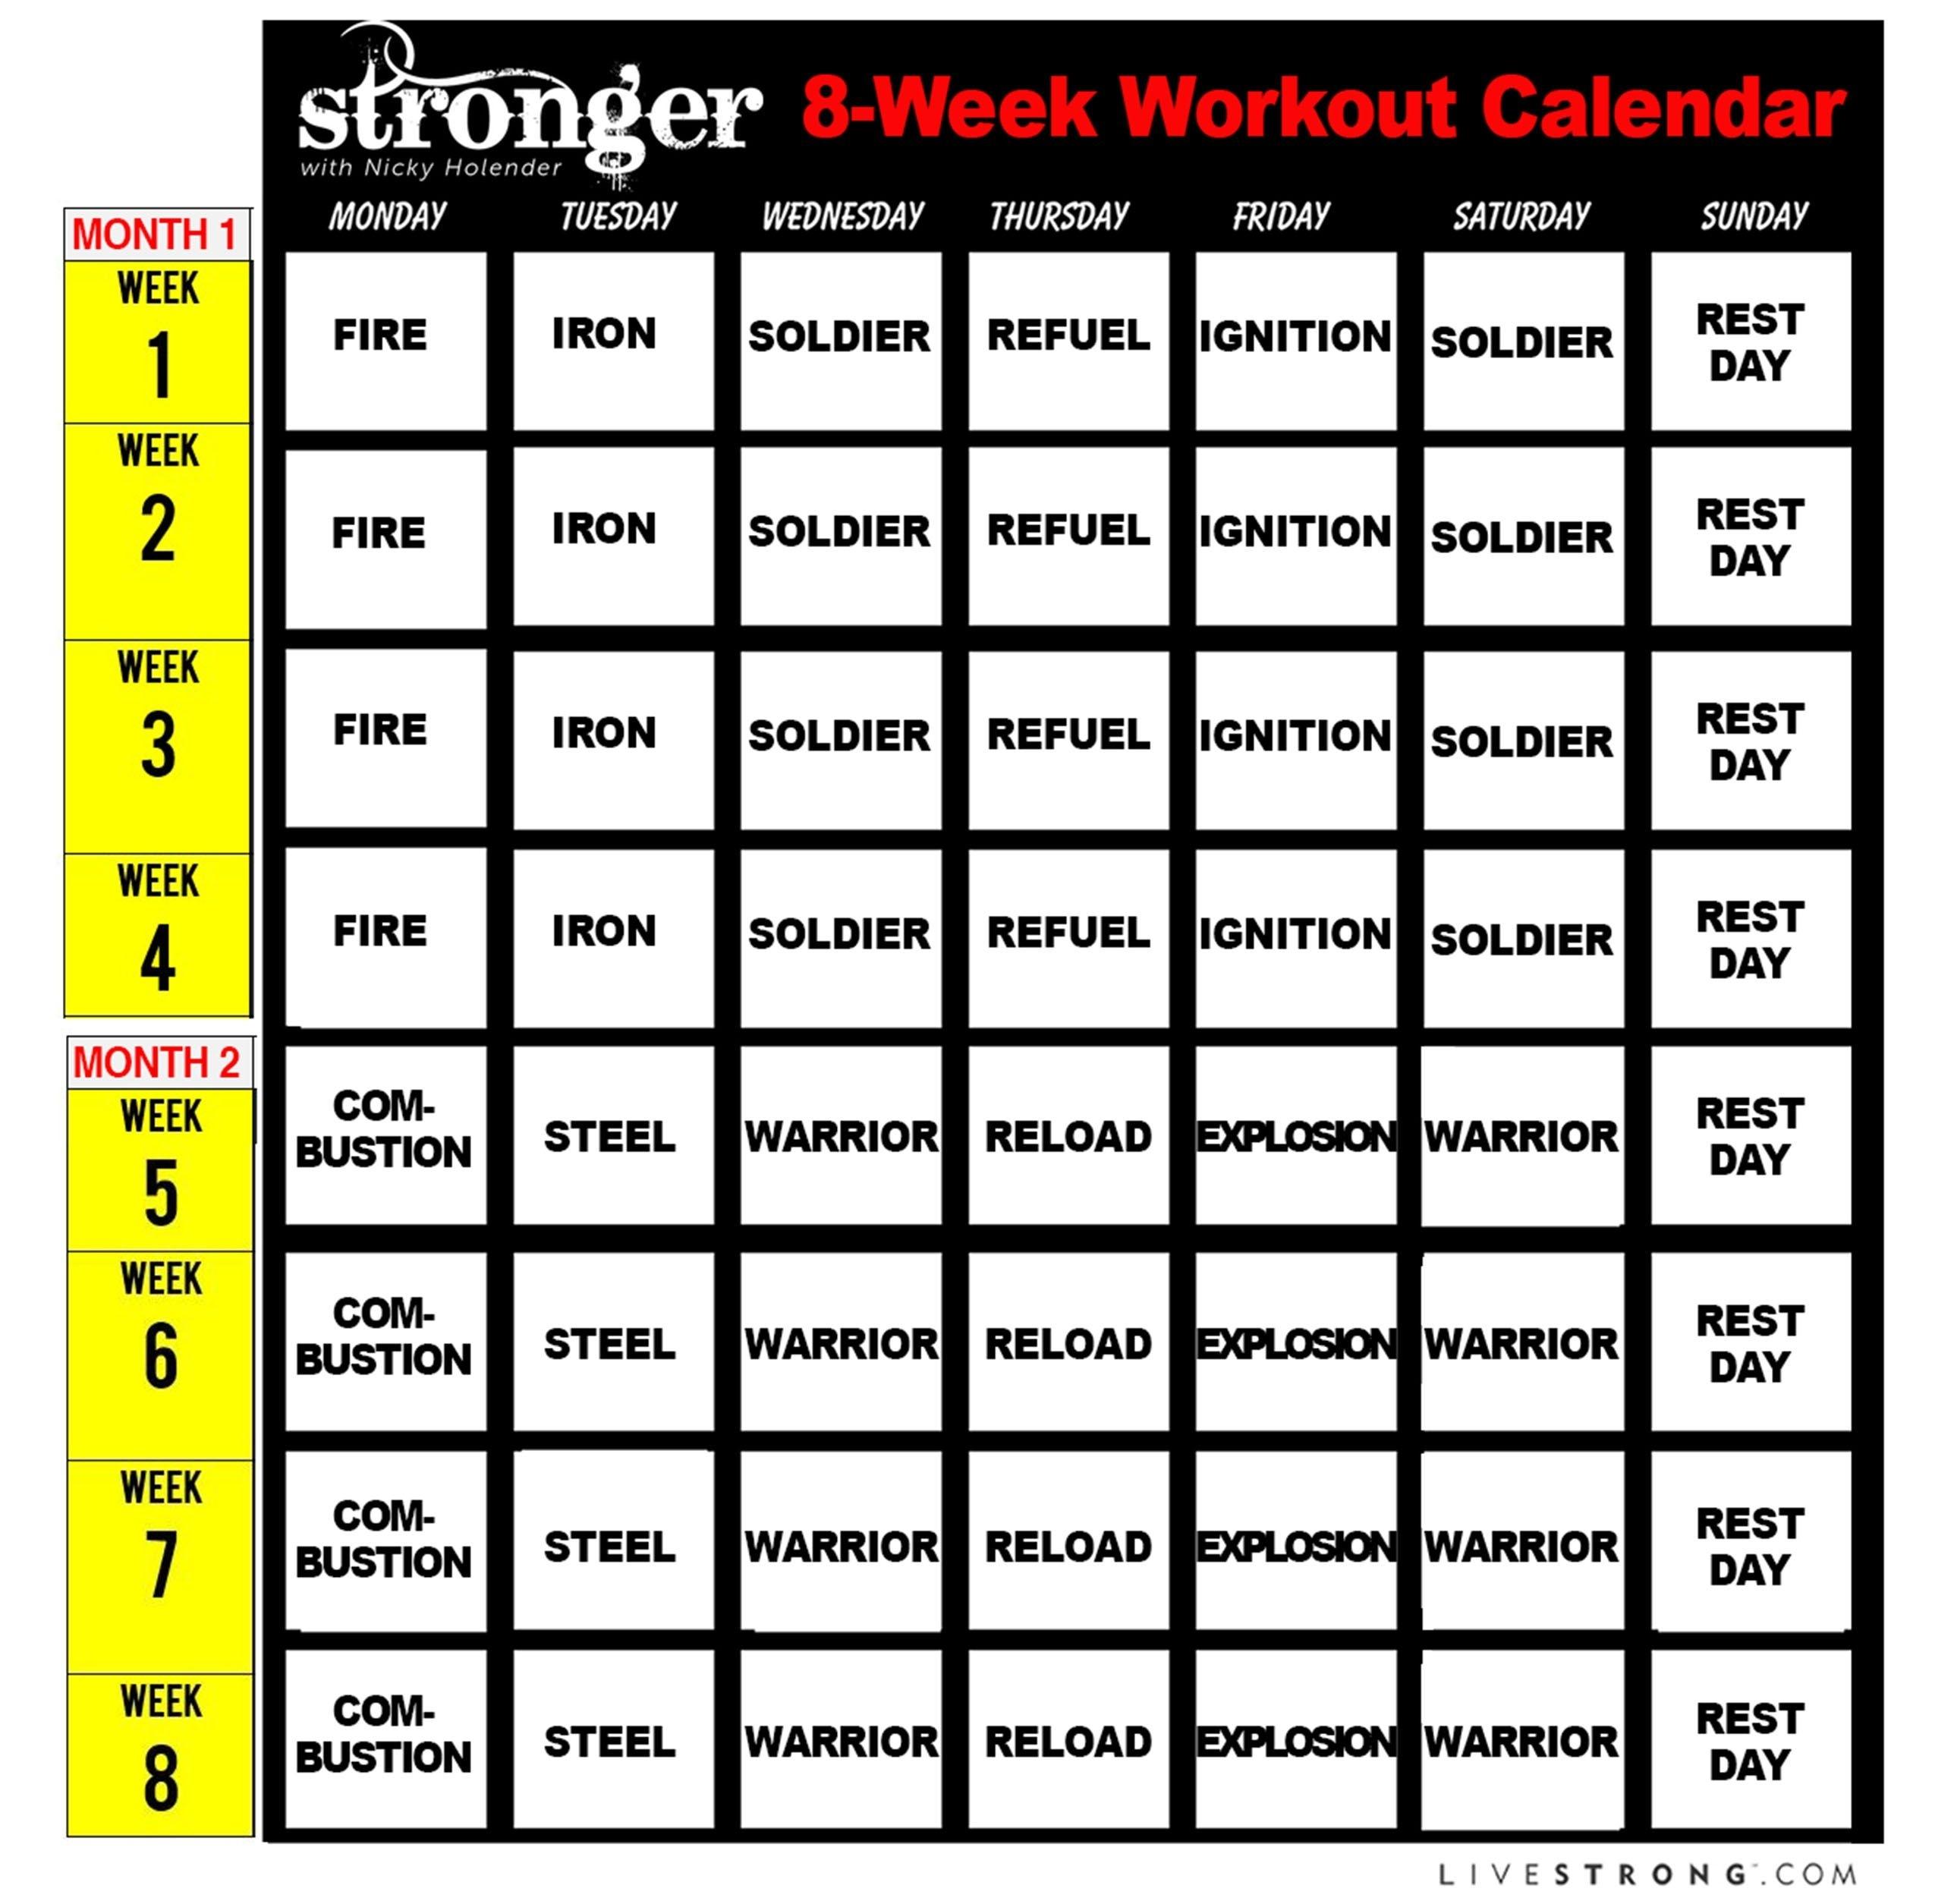 Printable 8-Week Workout Calendar And 10 Free Workout Videos